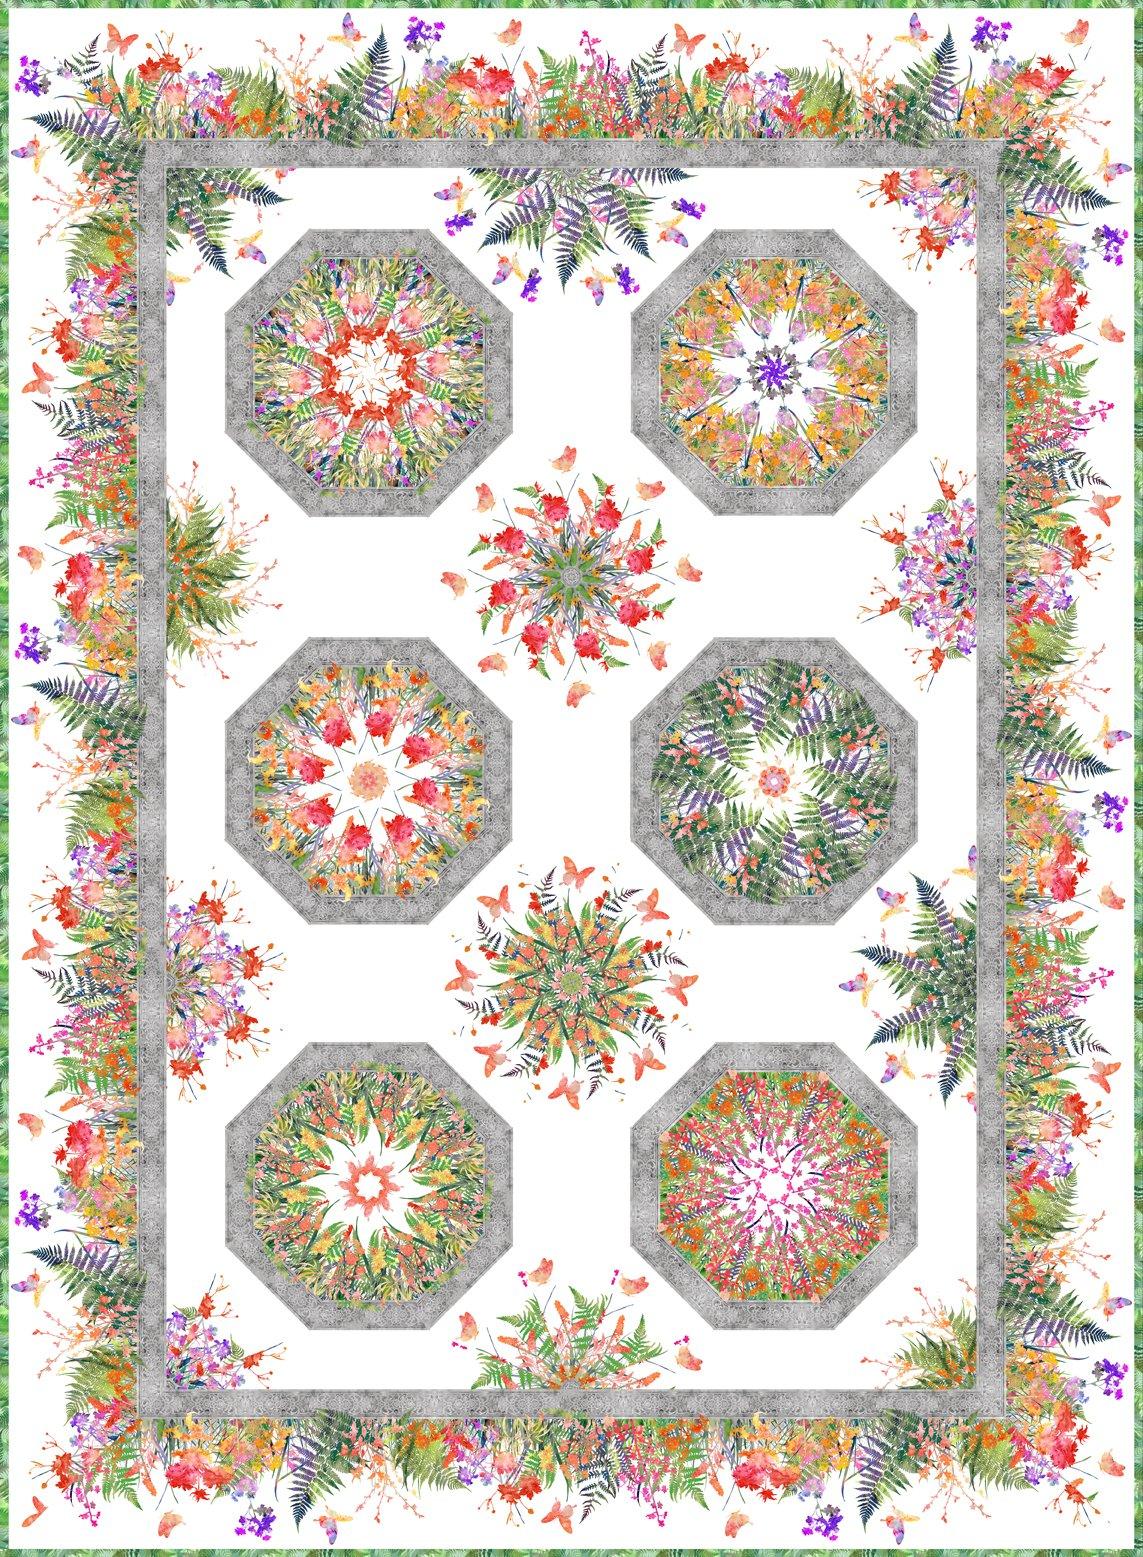 Garden of Dreams Kaleidoscope Quilt Pattern